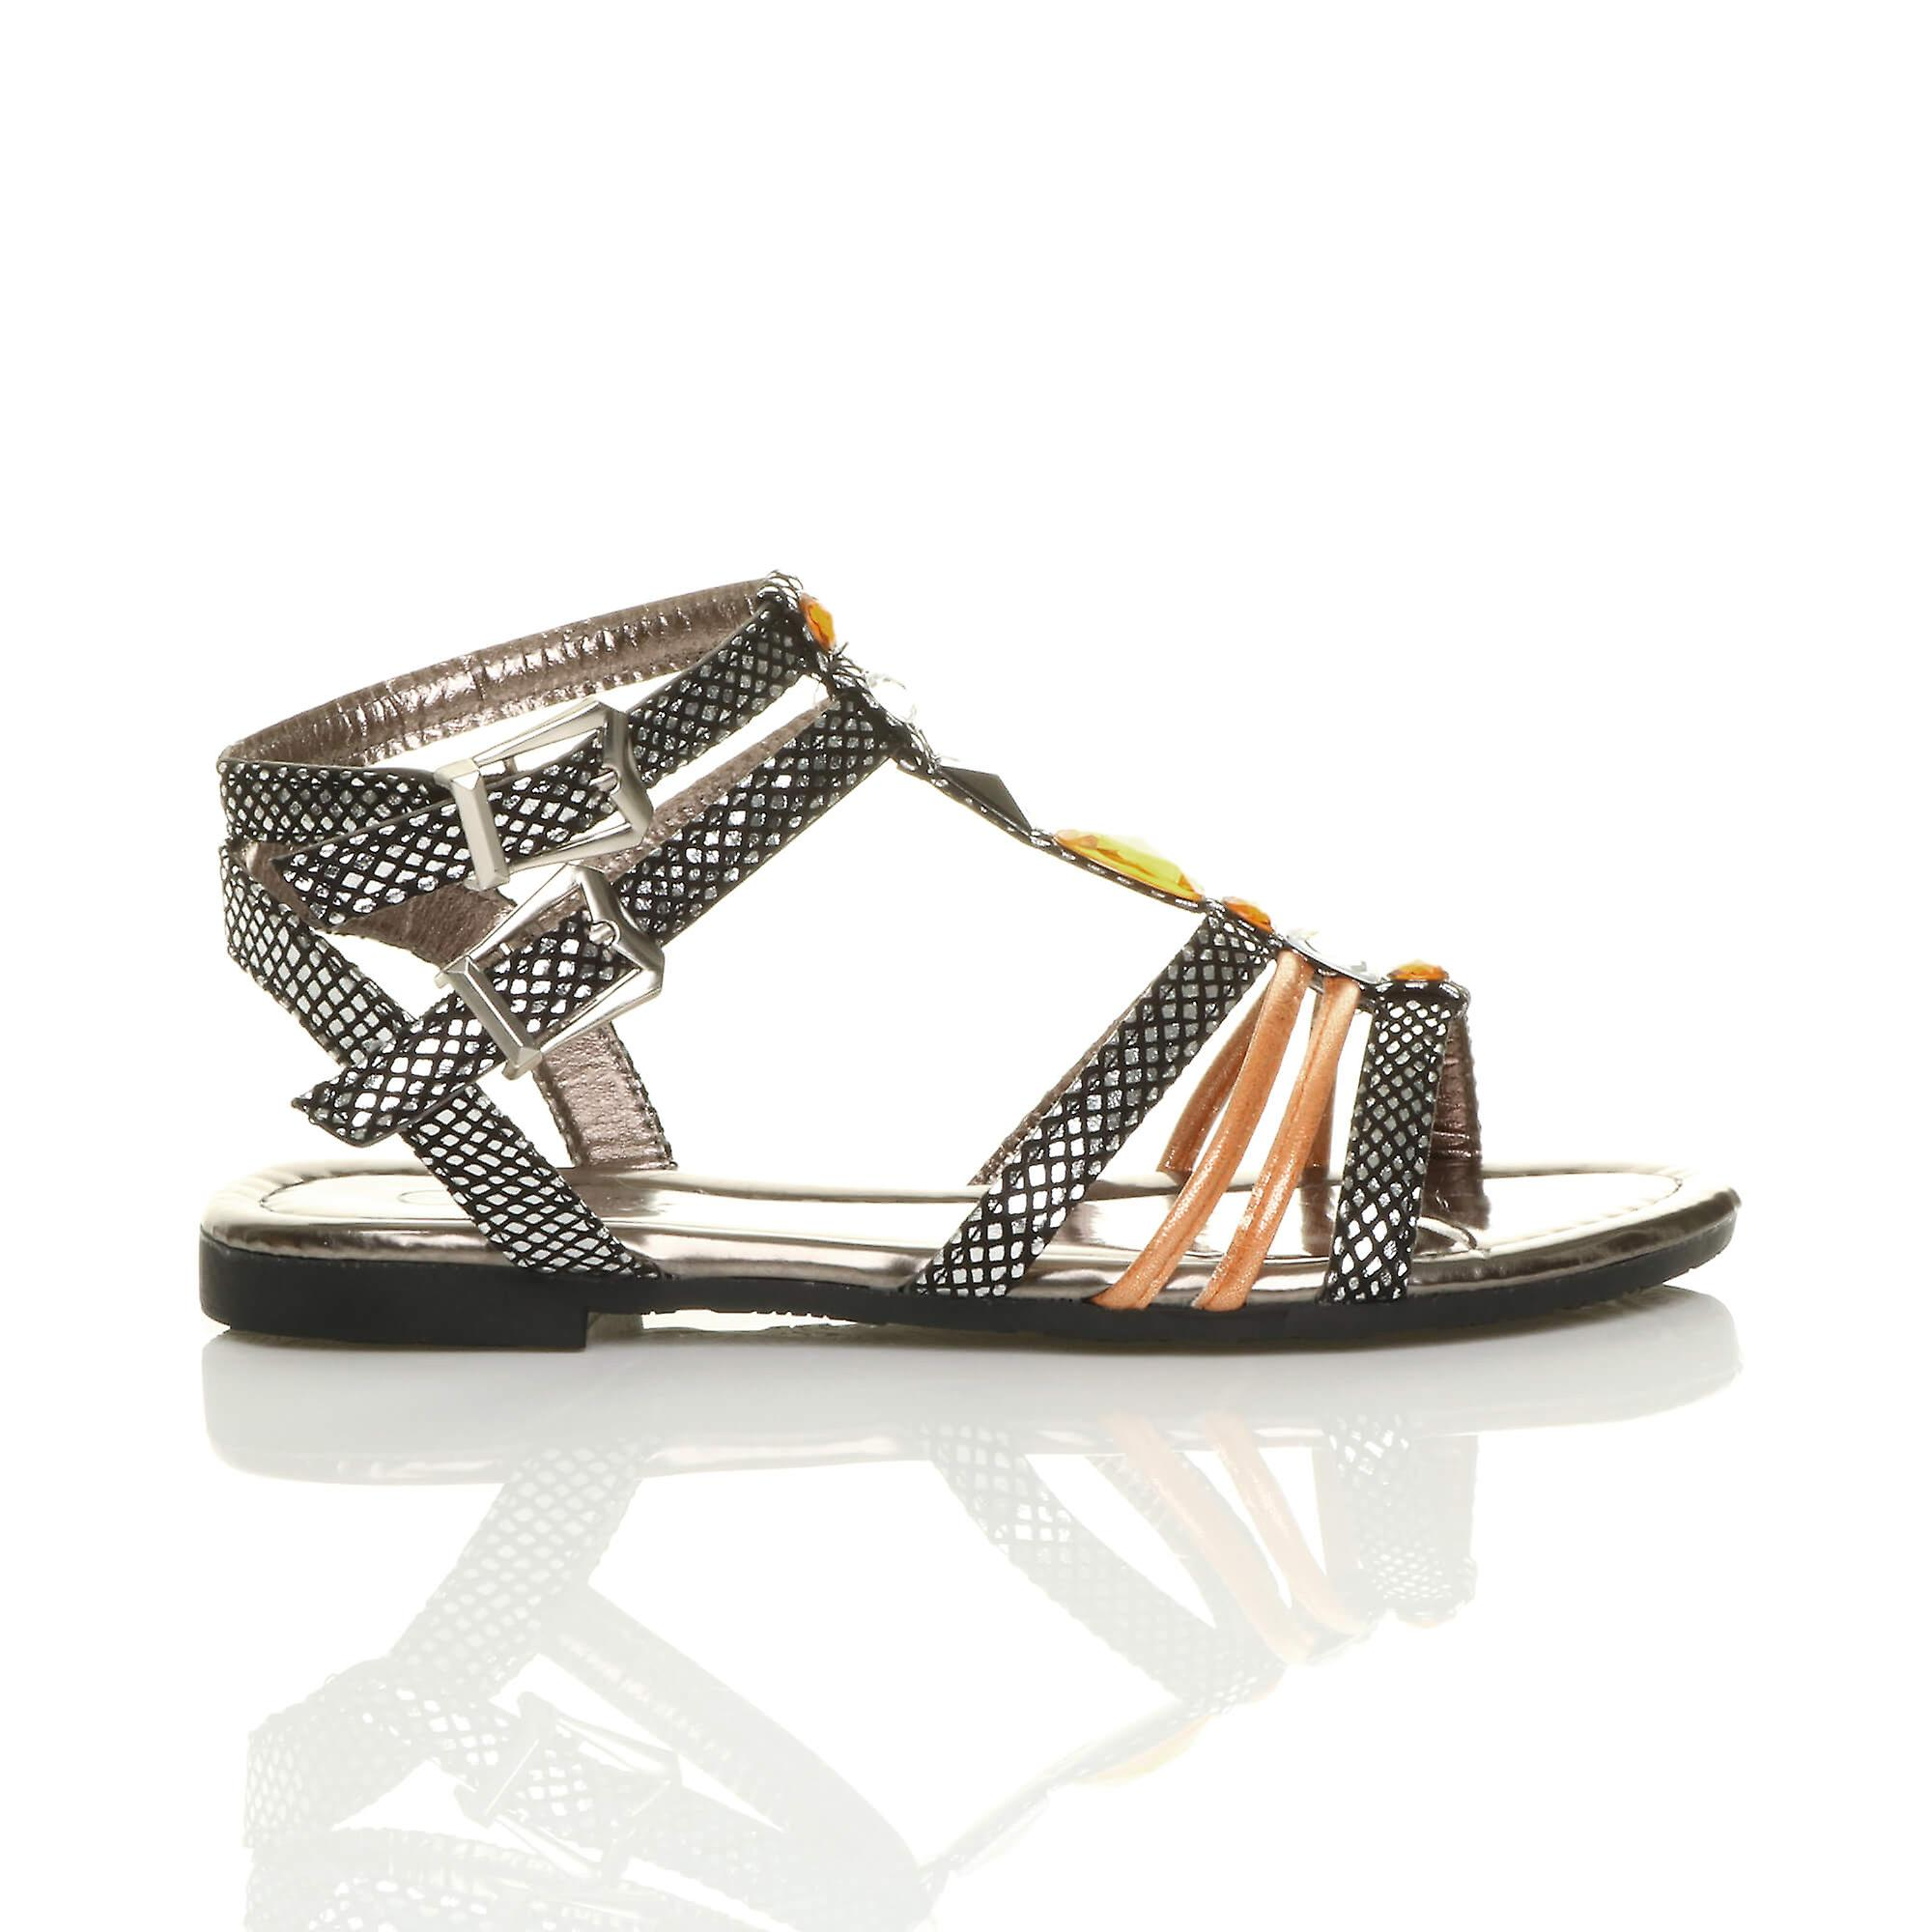 Ajvani womens plat strappy t-bar gladiator enkel riem gesp gem sandalen - Gratis verzending APQQA7